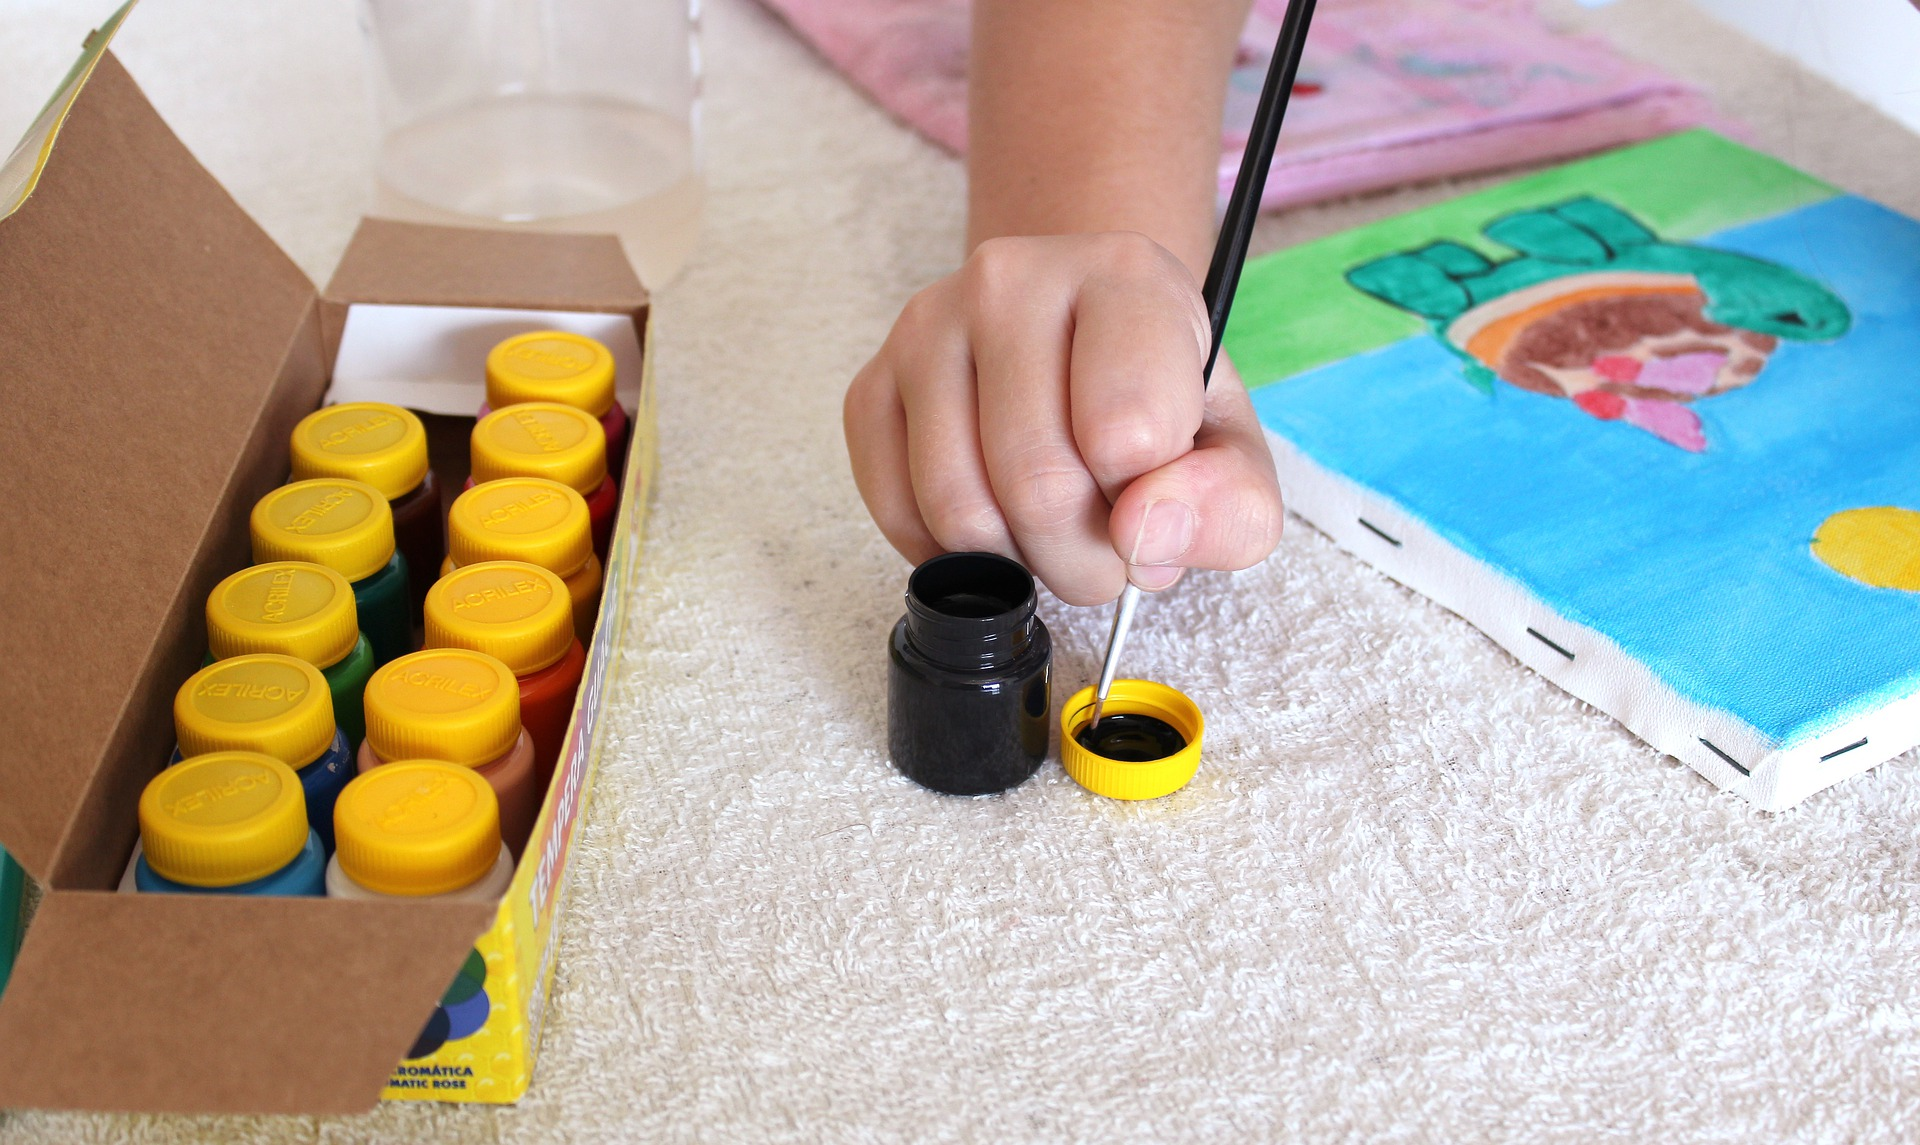 Child mixing paints